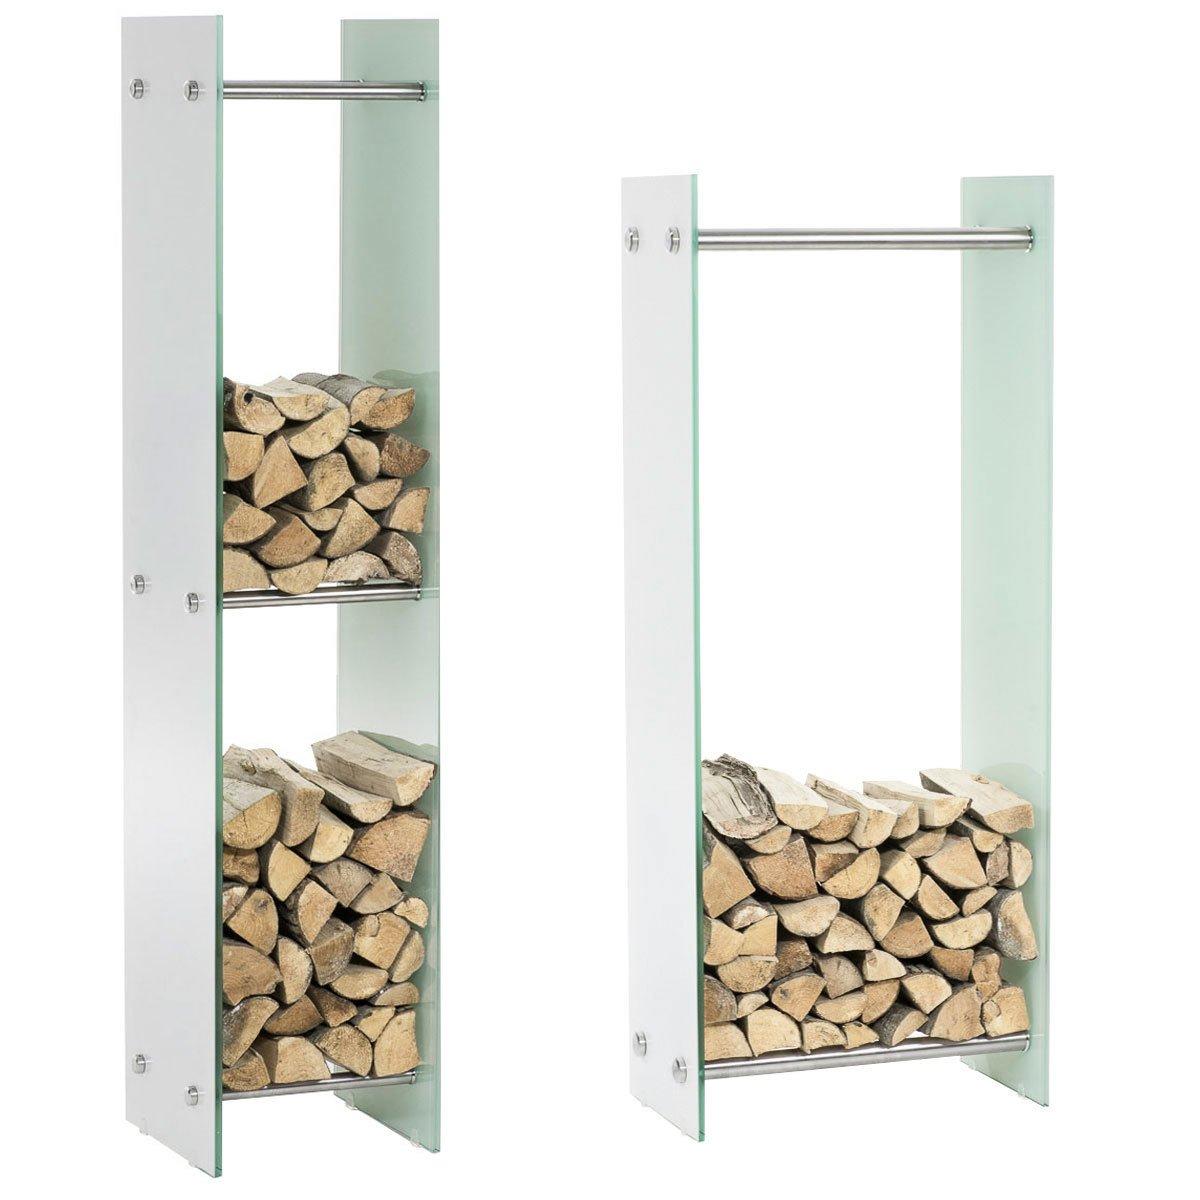 CLP Kaminholzregal Kaminholzständer Dacio Weißglas I Stabile Konstruktion I Holzlager I modernes Glasregal mit Bodenschonern 35x60x150 cm